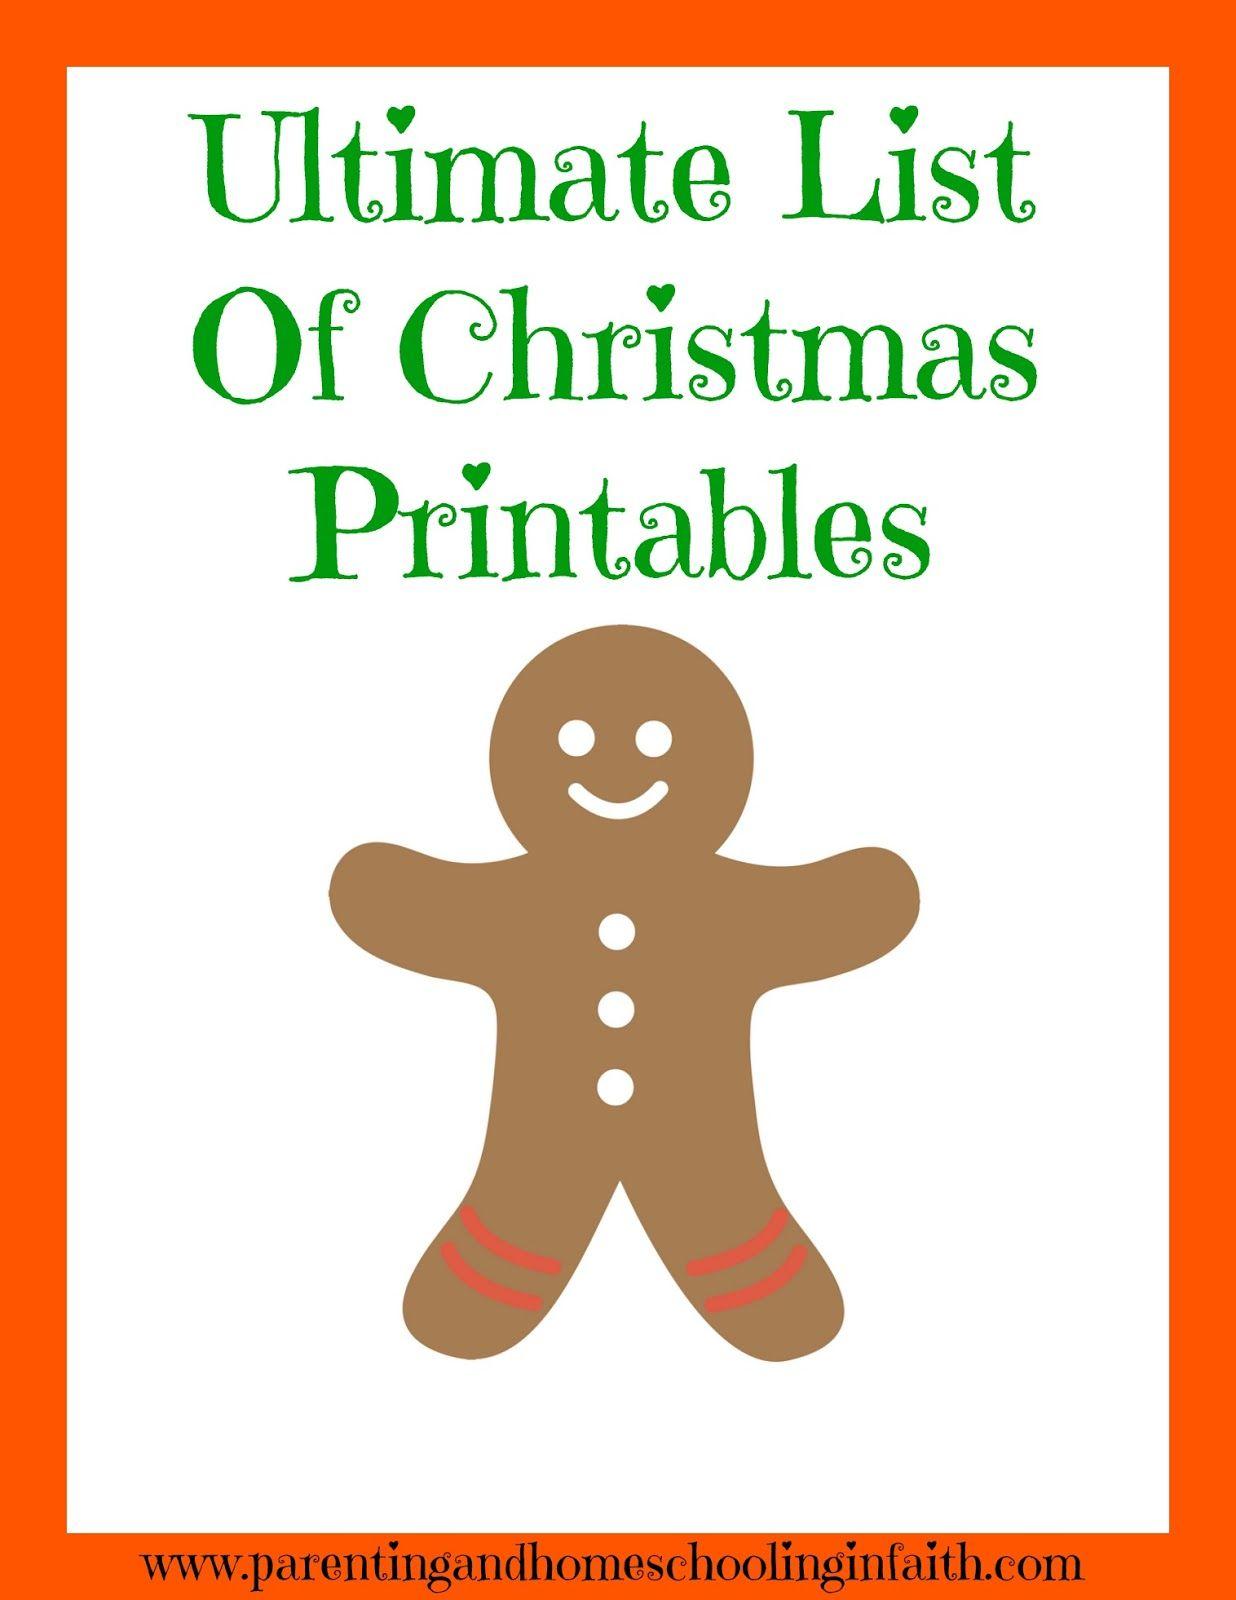 The Ultimate List of Christmas Printables For Kids